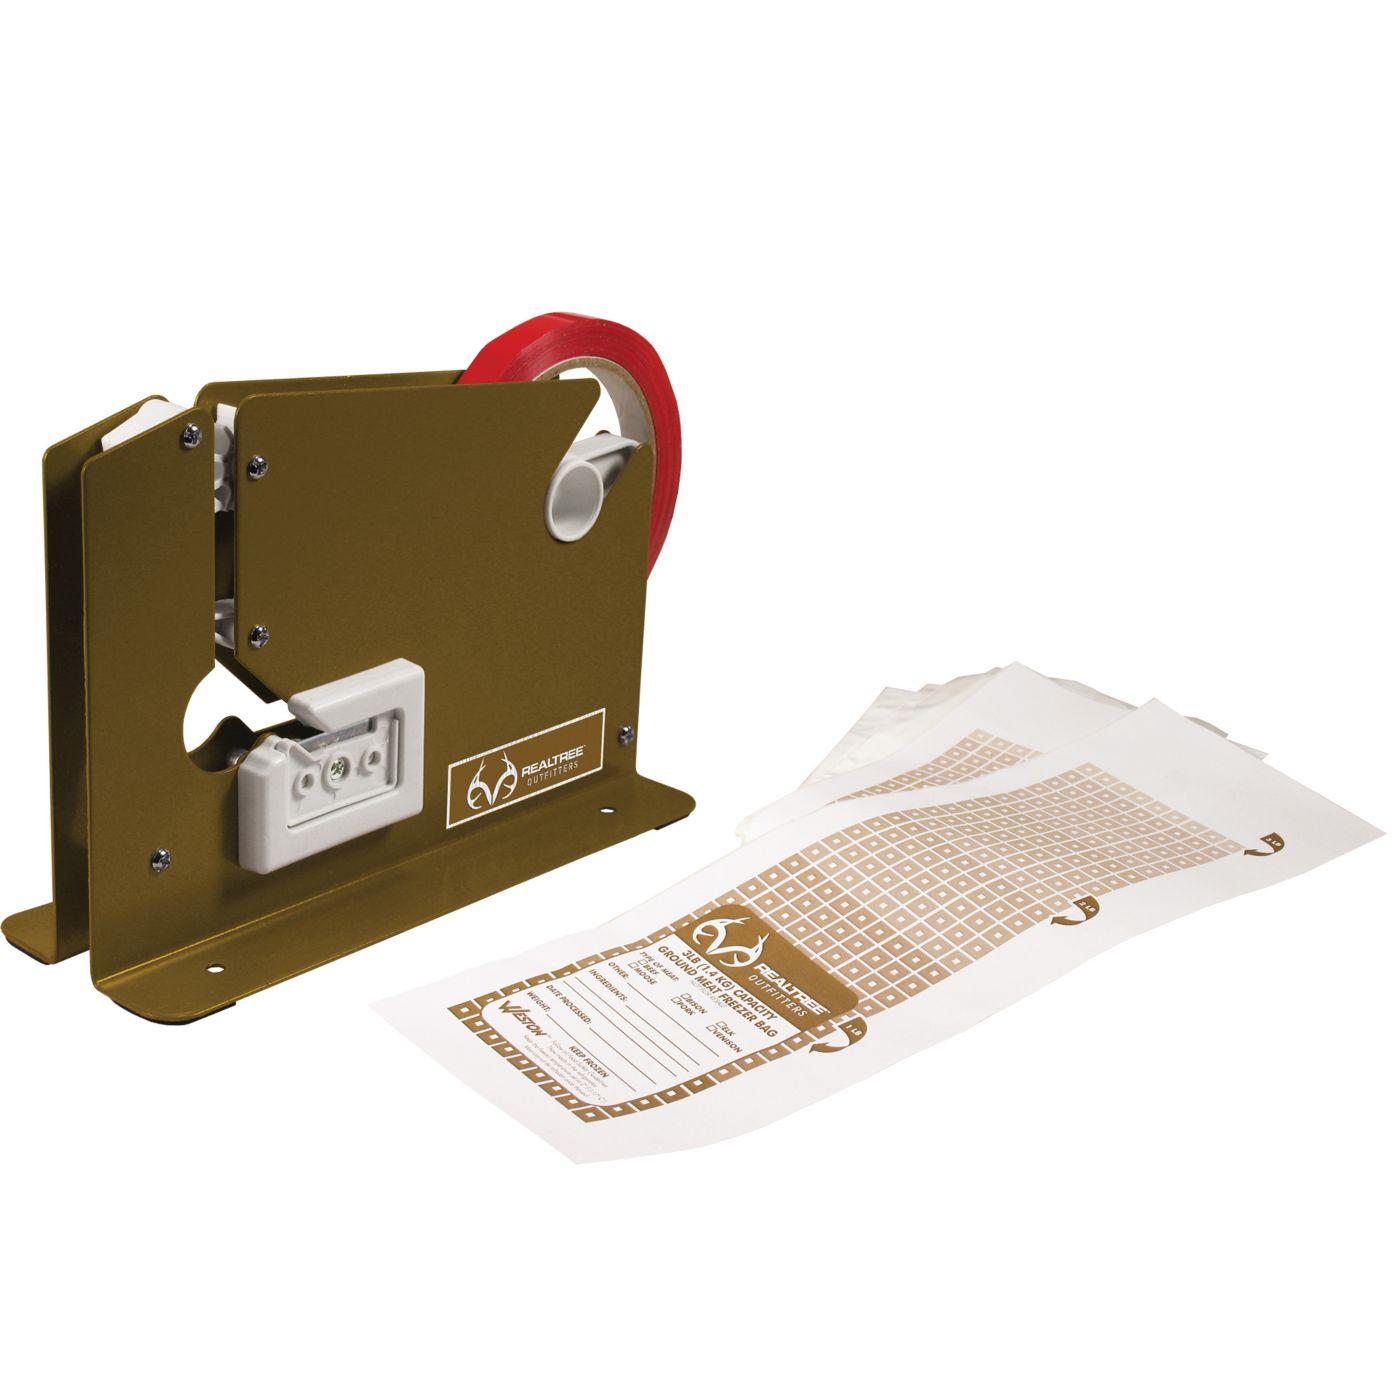 Weston Meat Sealer and Bag Kit